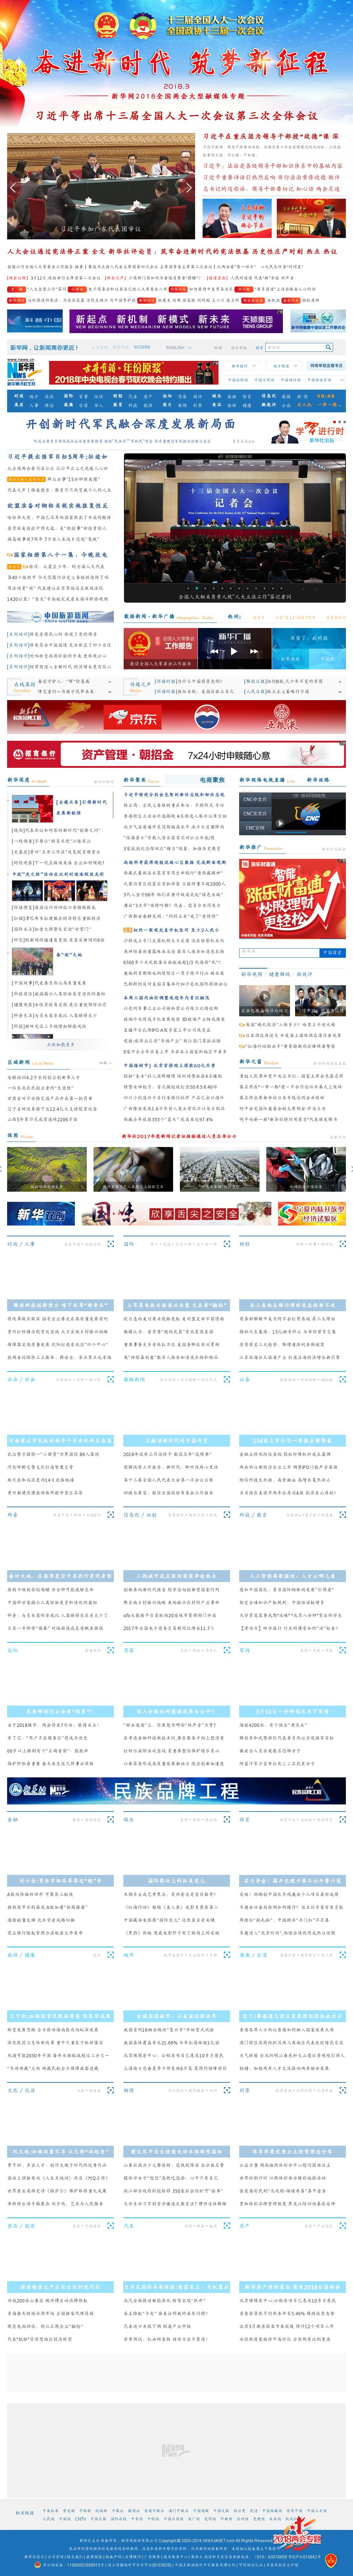 Xinhua at Monday March 12, 2018, 7:25 a.m. UTC